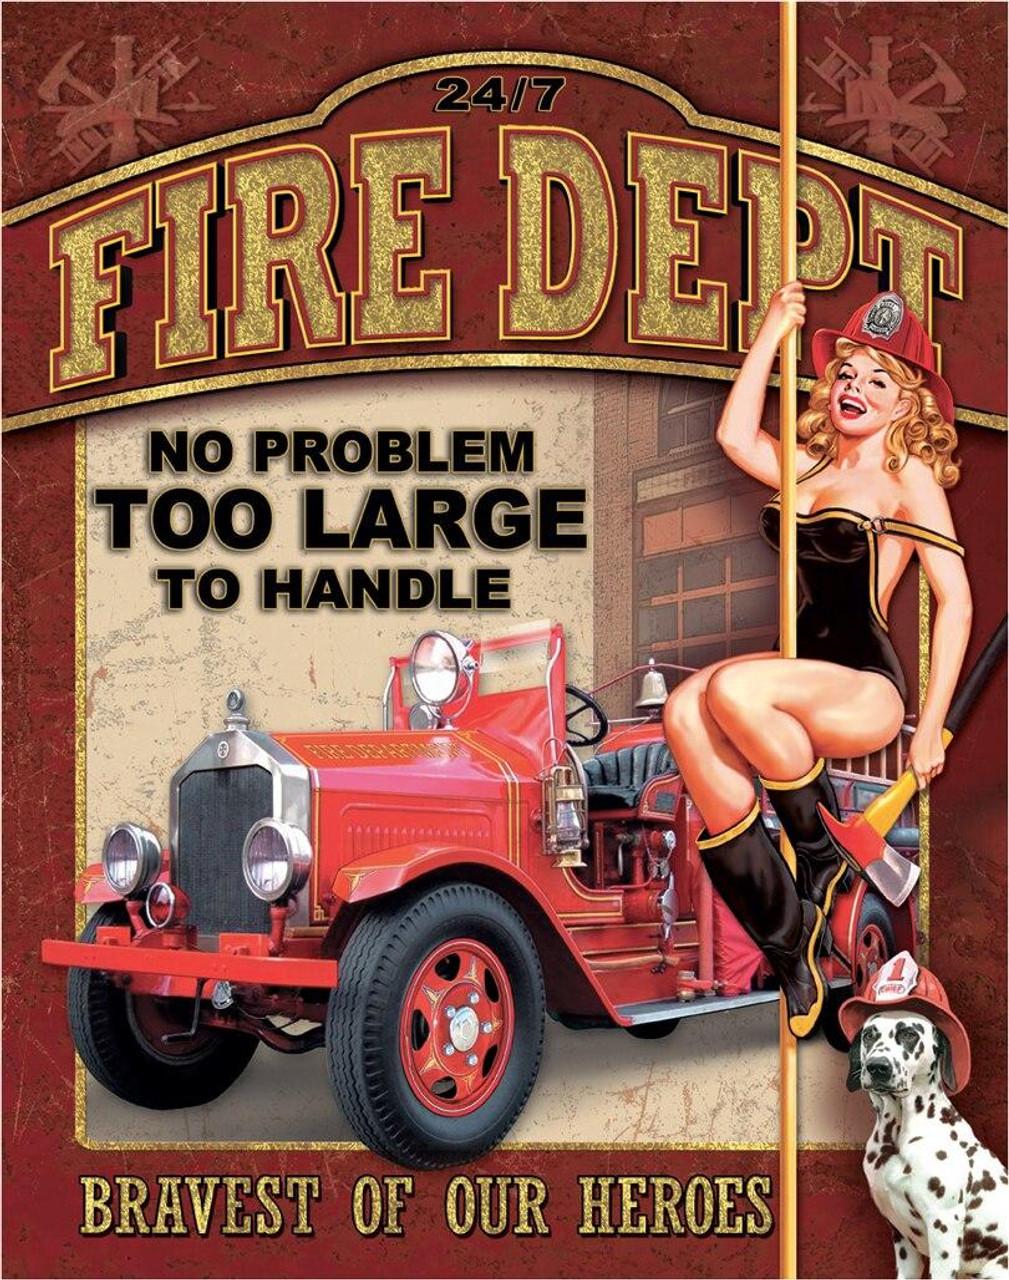 Fire Dept - No Problem